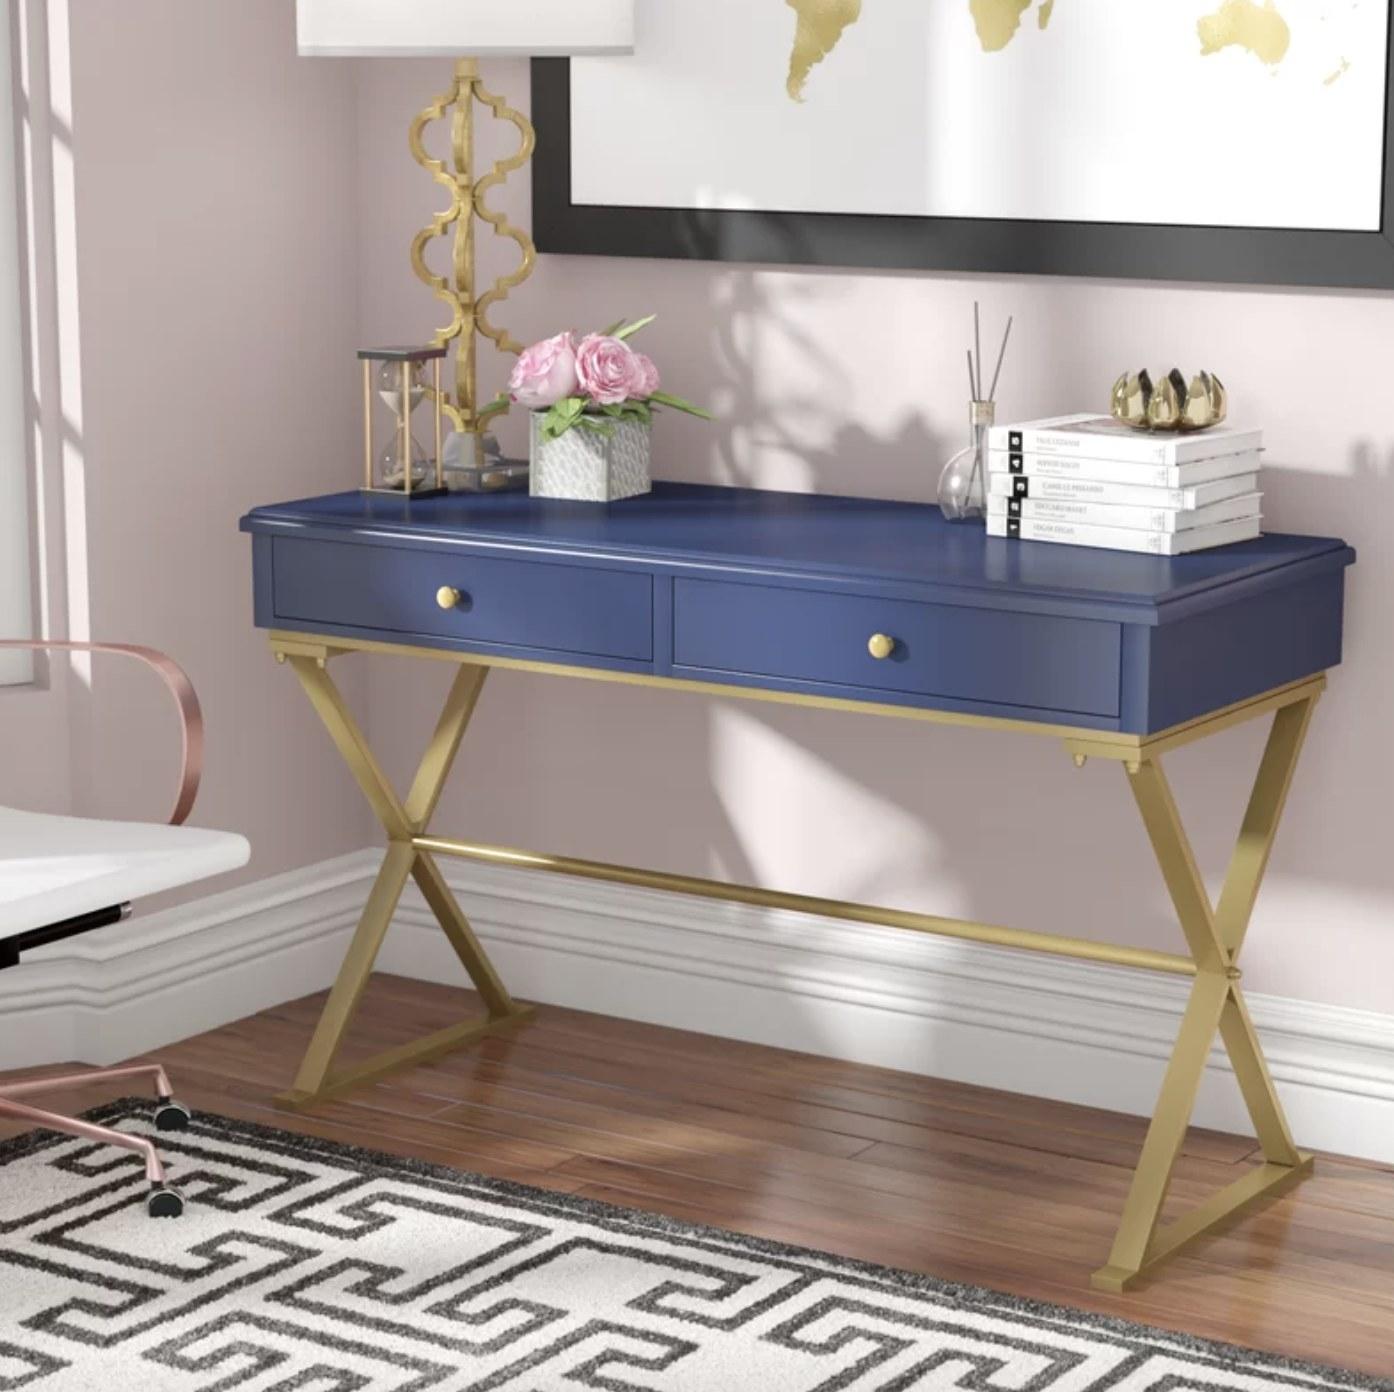 the desk in navy blue